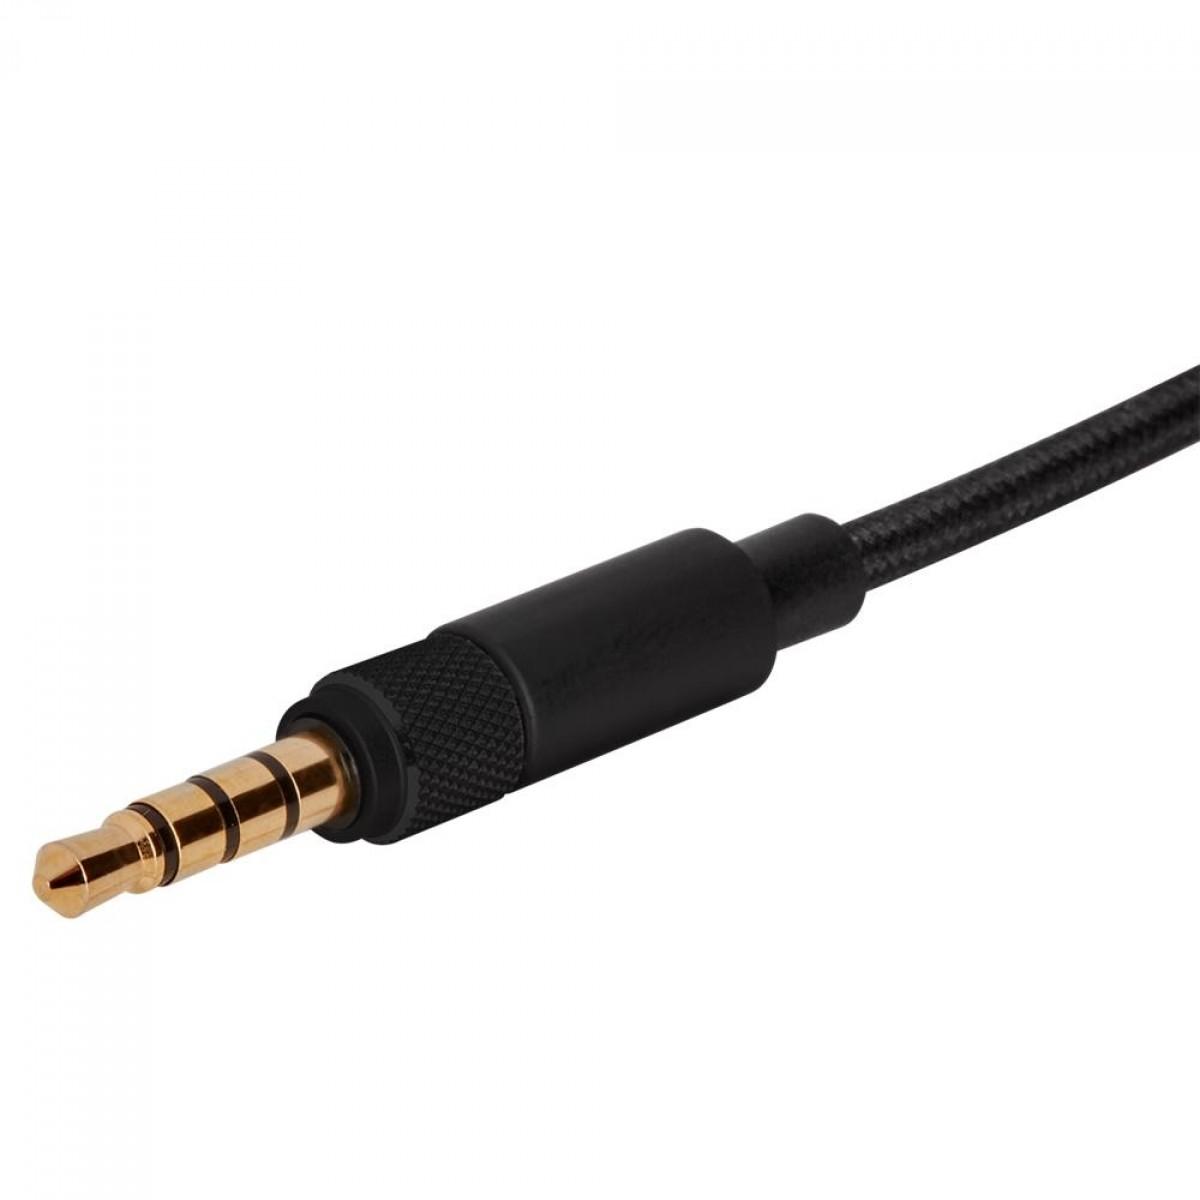 Headset Gamer Corsair Virtuoso, USB + Wireless + 3.5mm, PC, PlayStation 4/5, Dispositivos Móveis, RGB, White, CA-9011186